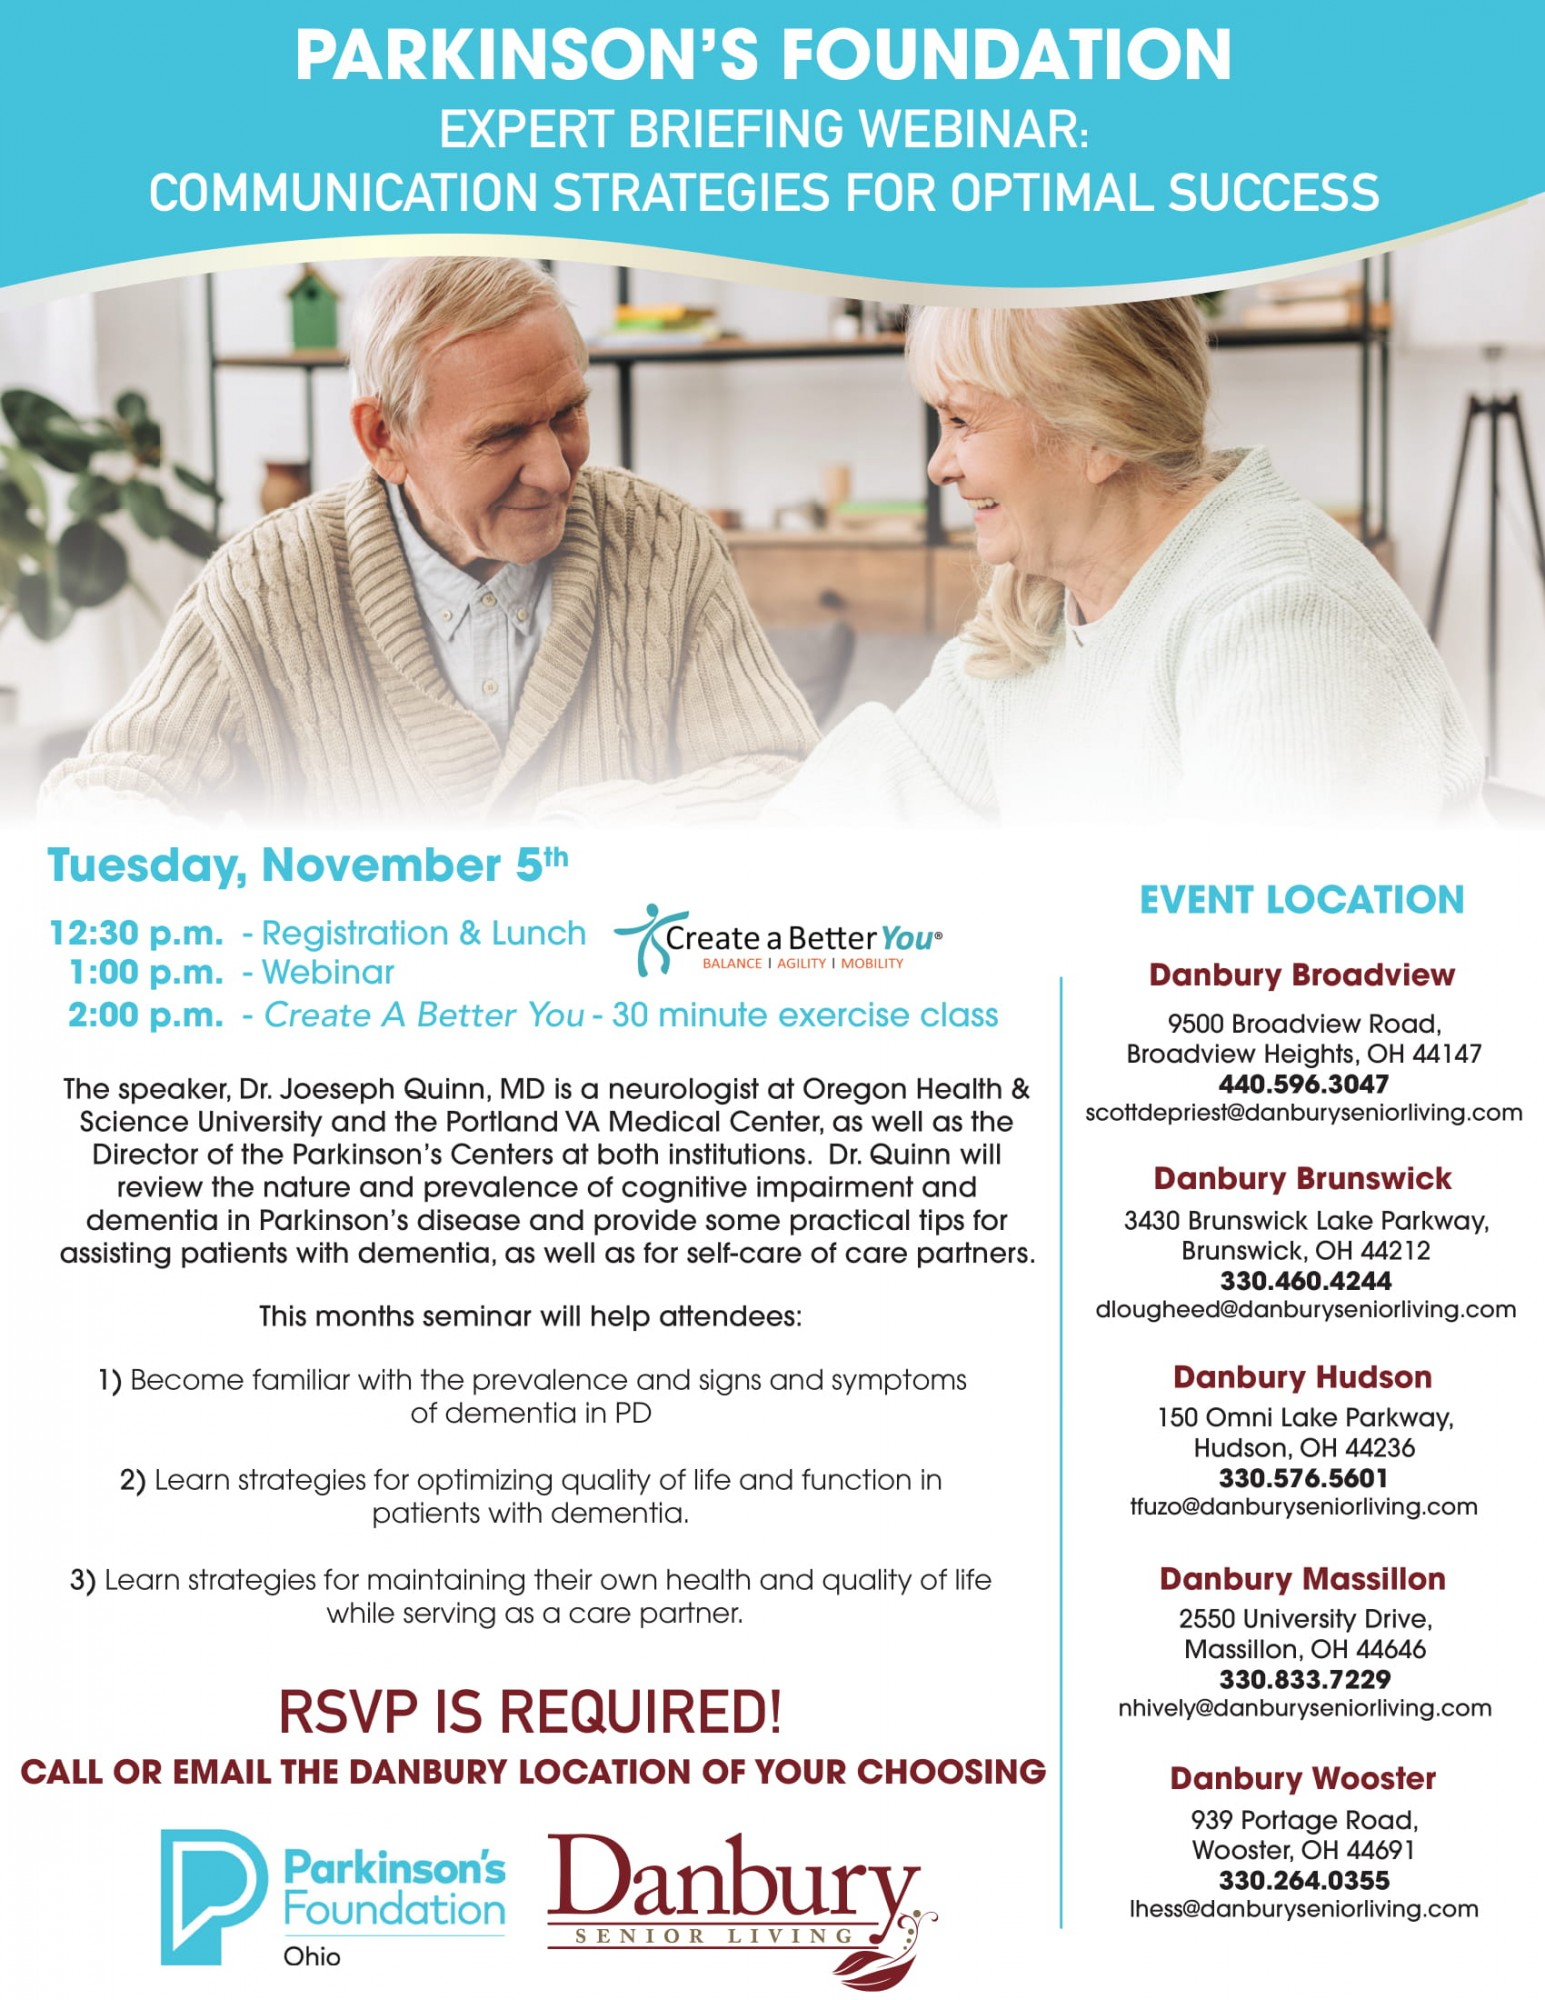 Parkinson S Foundation Expert Briefing Webinar Danbury